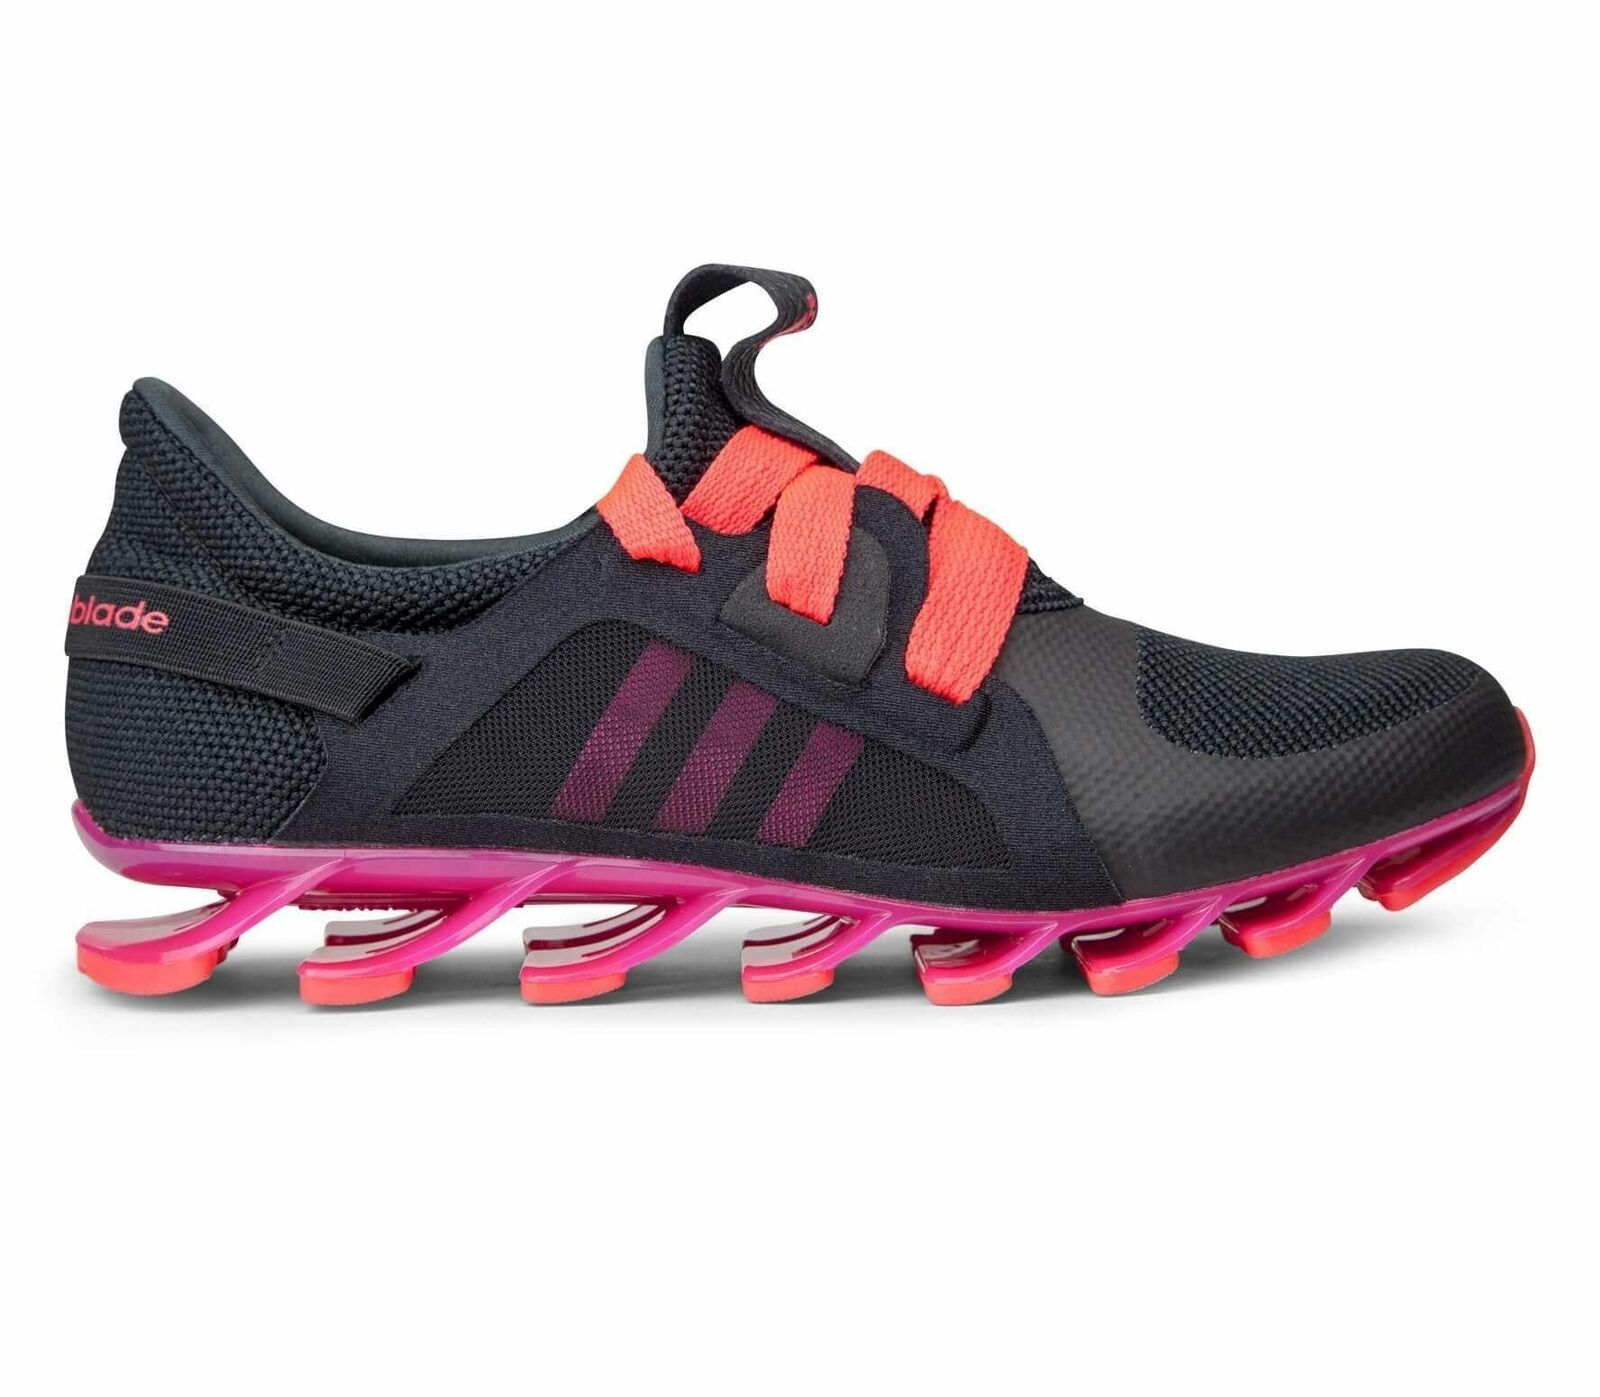 Adidas Springblade Springblade Springblade Nanaya AQ7542 Mujer Running Zapatillas   neutral UK 3.5 a 7.5  suministramos lo mejor